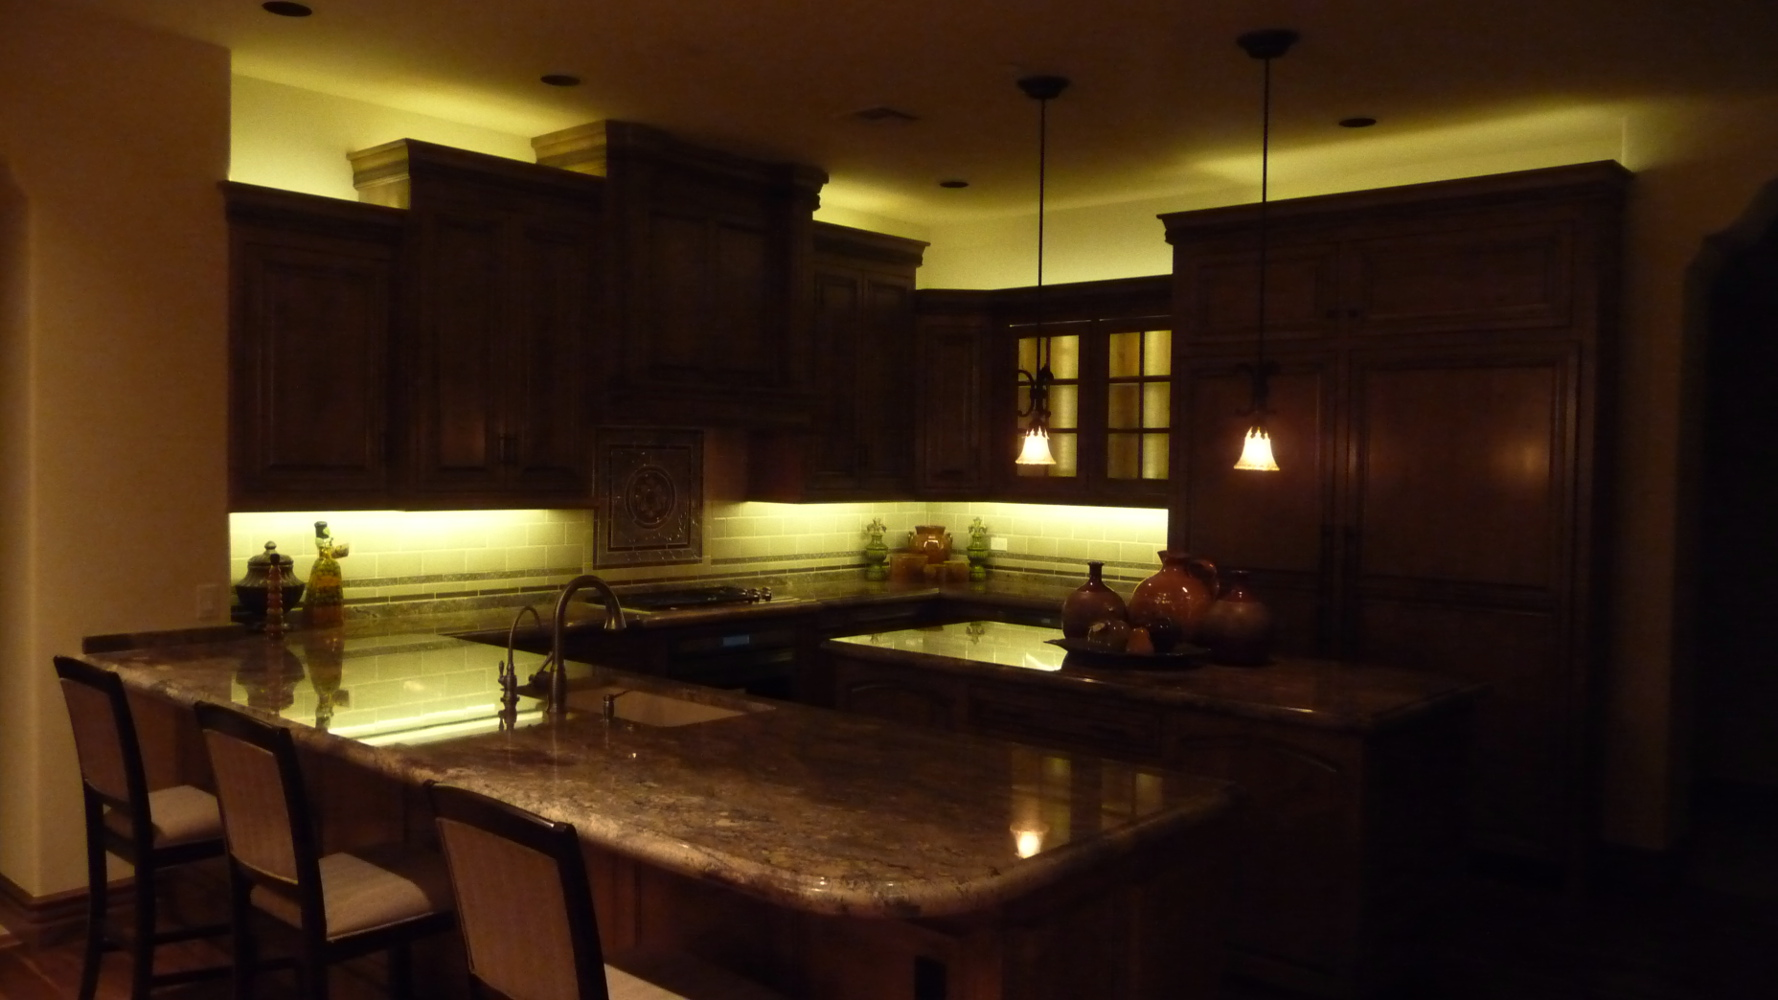 kitchen cabinets lighting ideas photo - 10